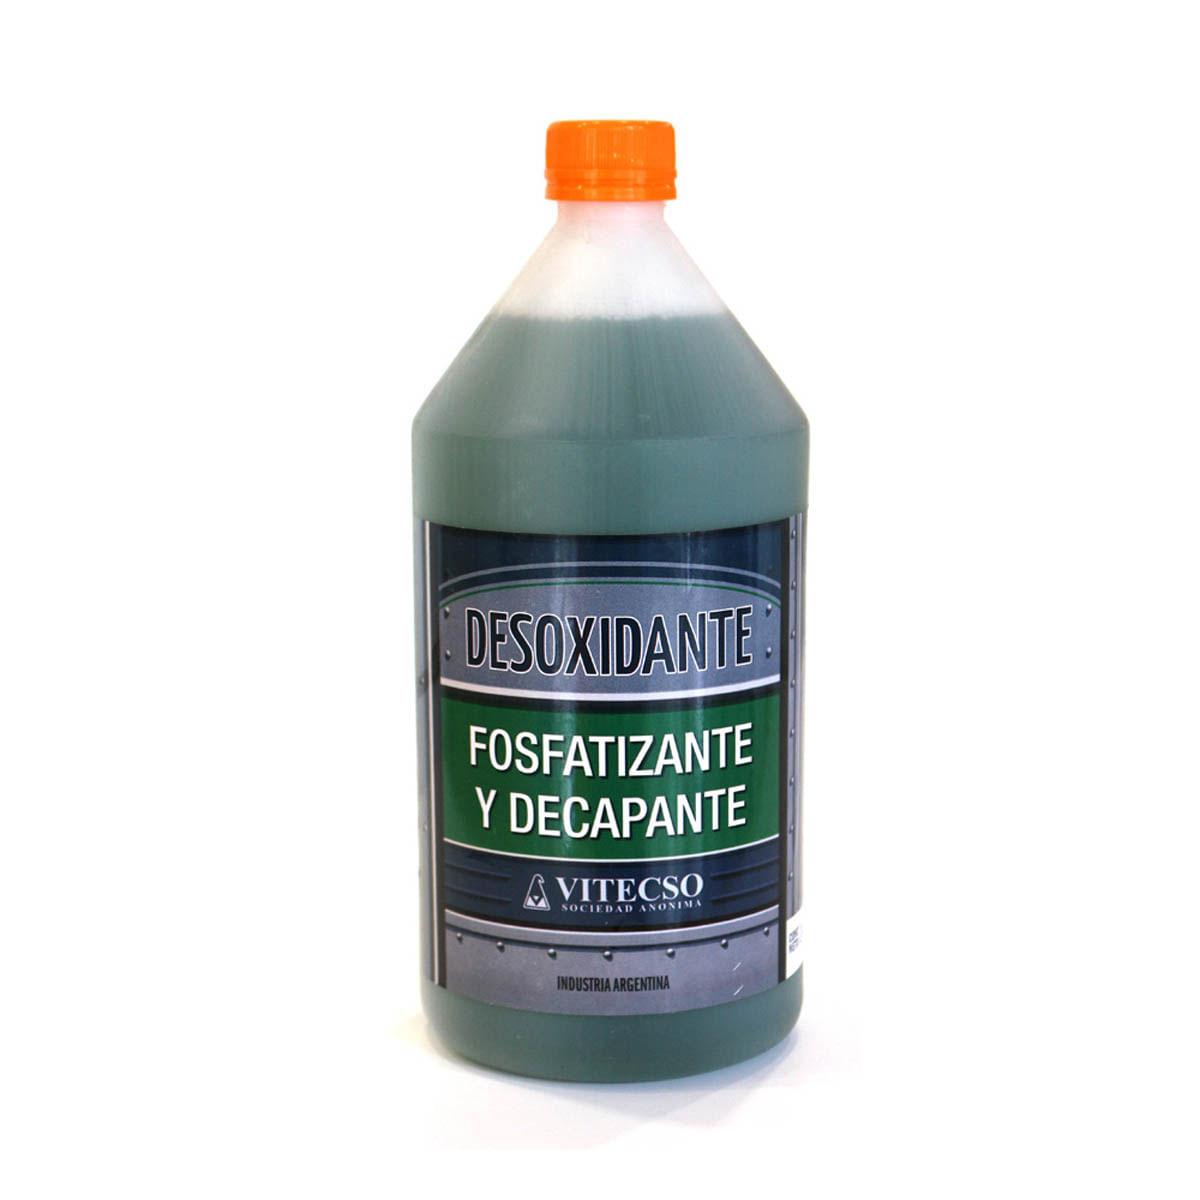 desoxidante-fosfatizante